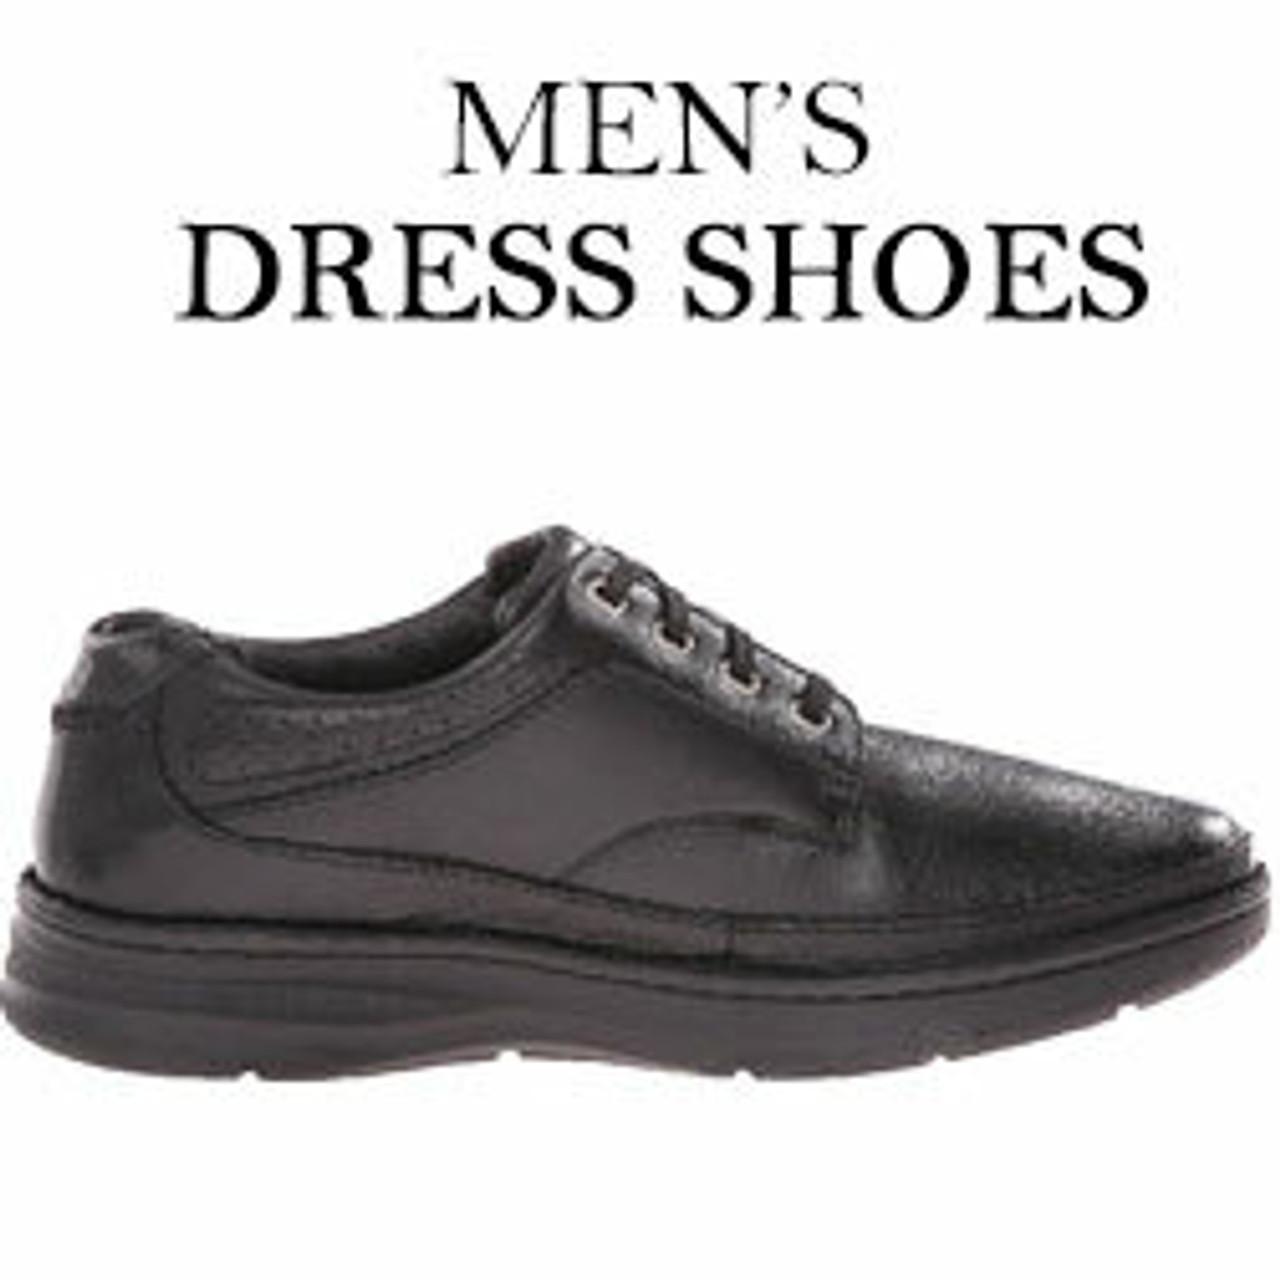 Mens Orthopedic Dress Shoes   Dress Shoes For Men